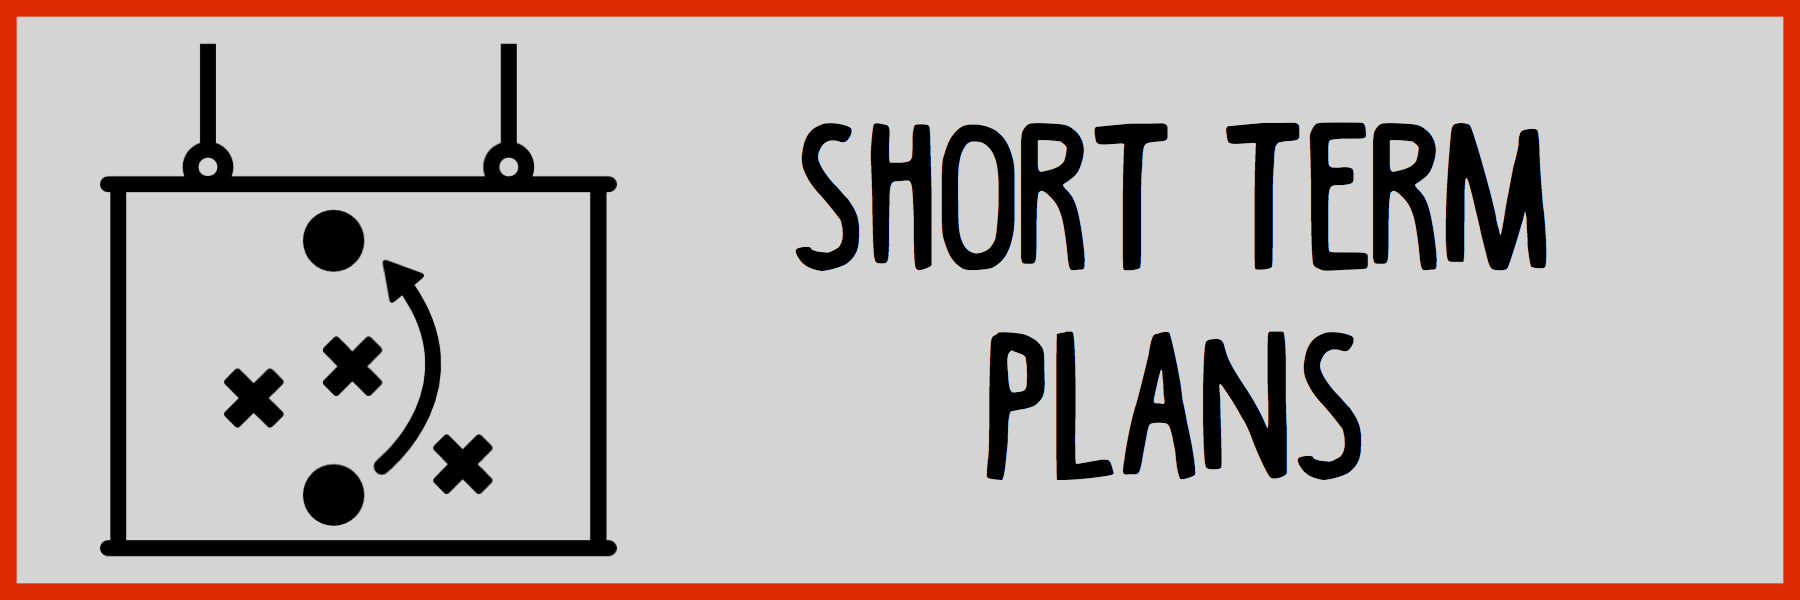 Short Term copy.jpg